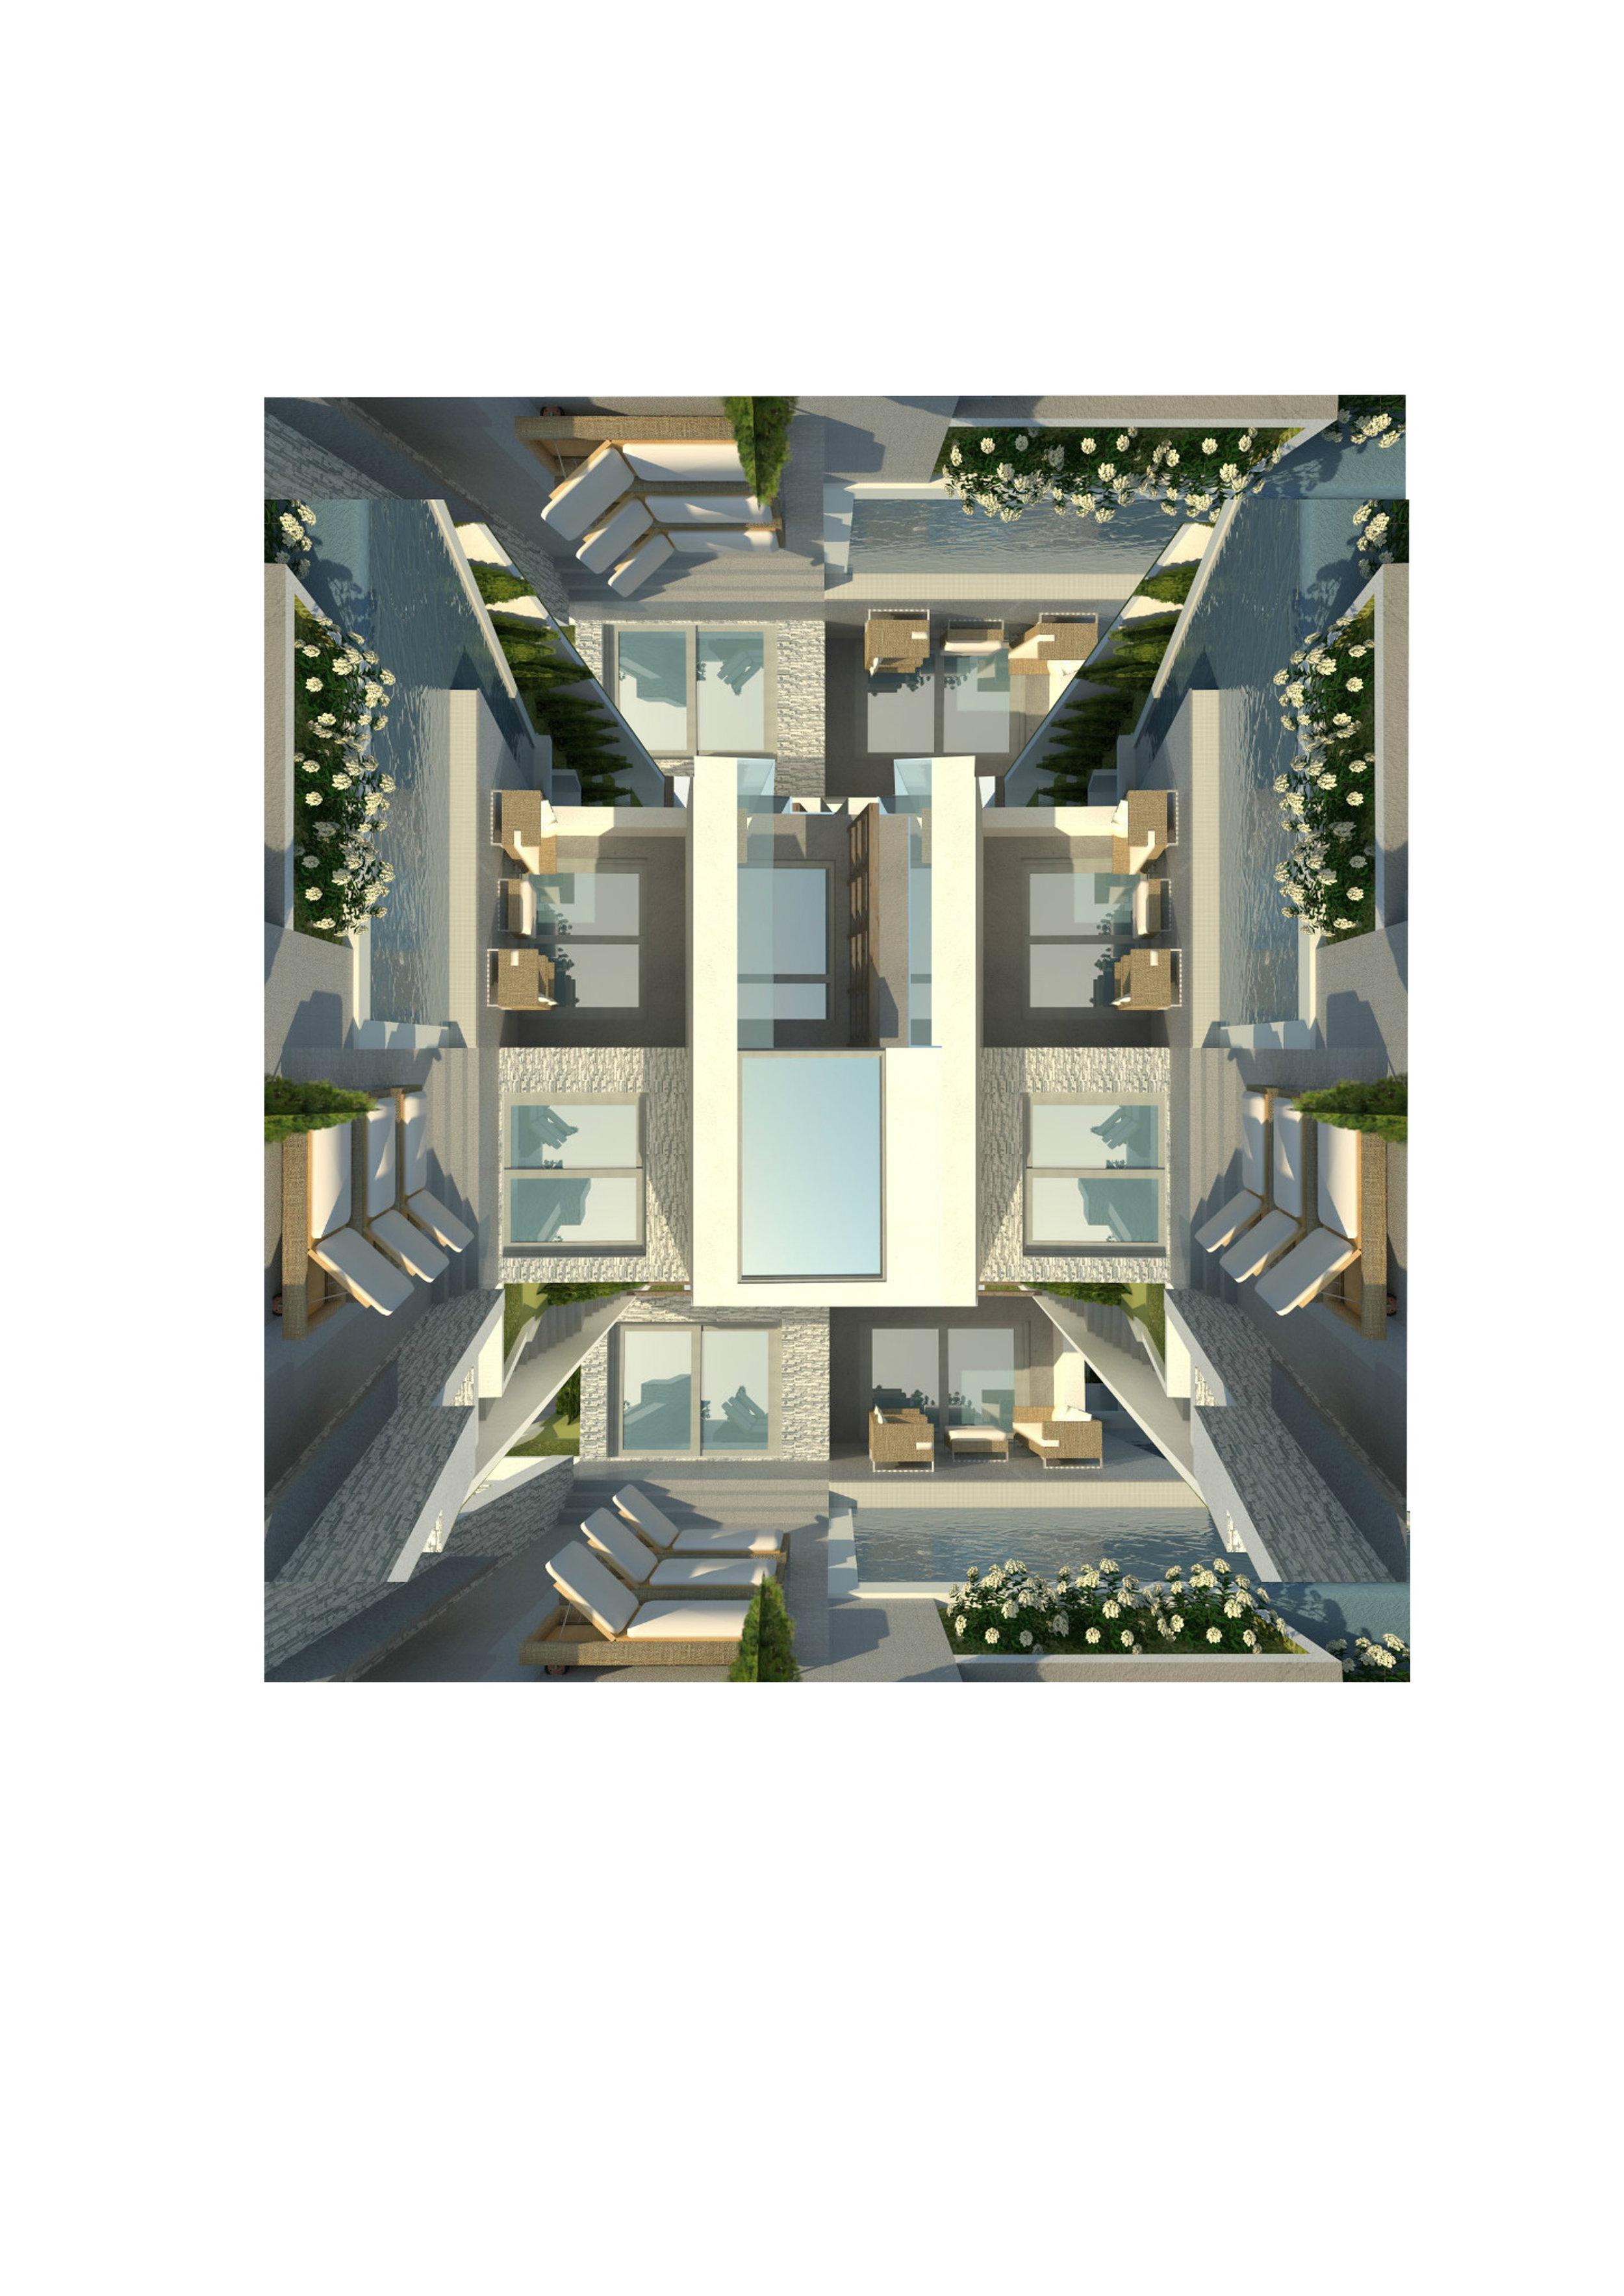 Luxury Villa 2, Digital Photo Frame, 2019